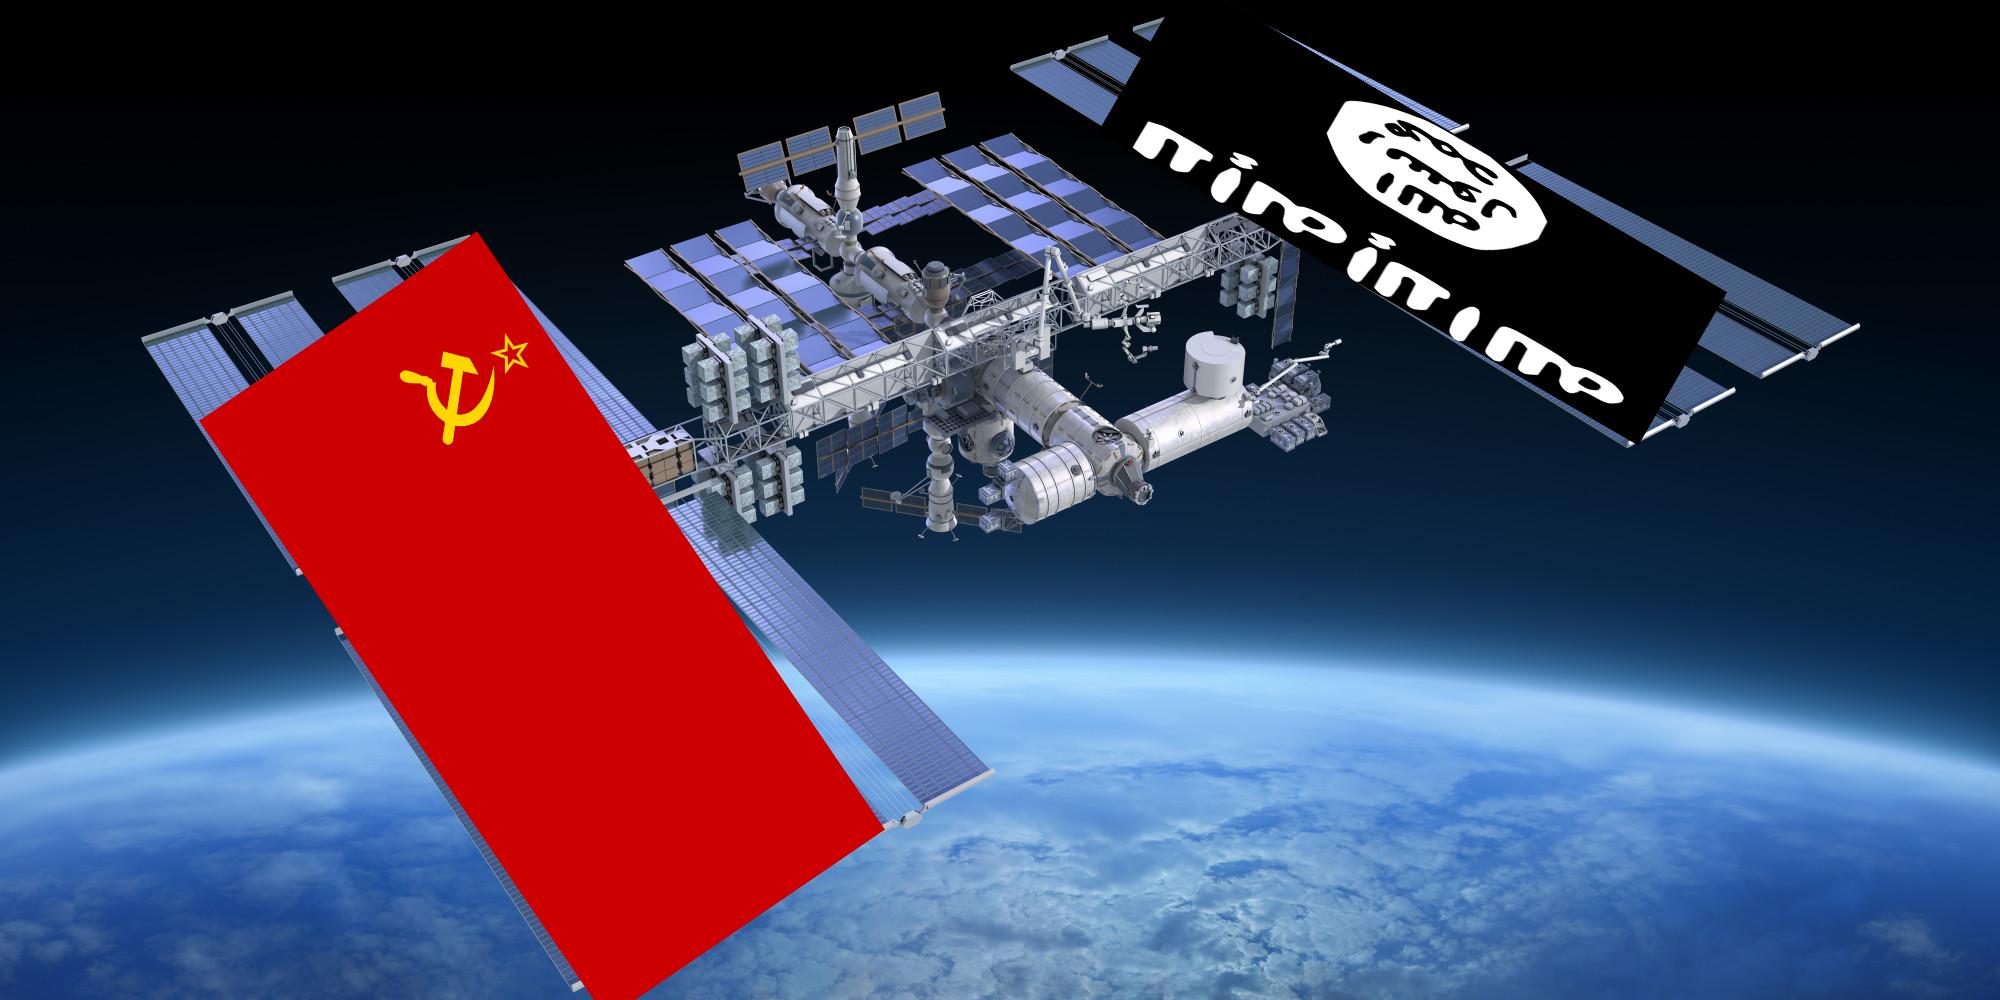 o-international-space-station-facebook.png